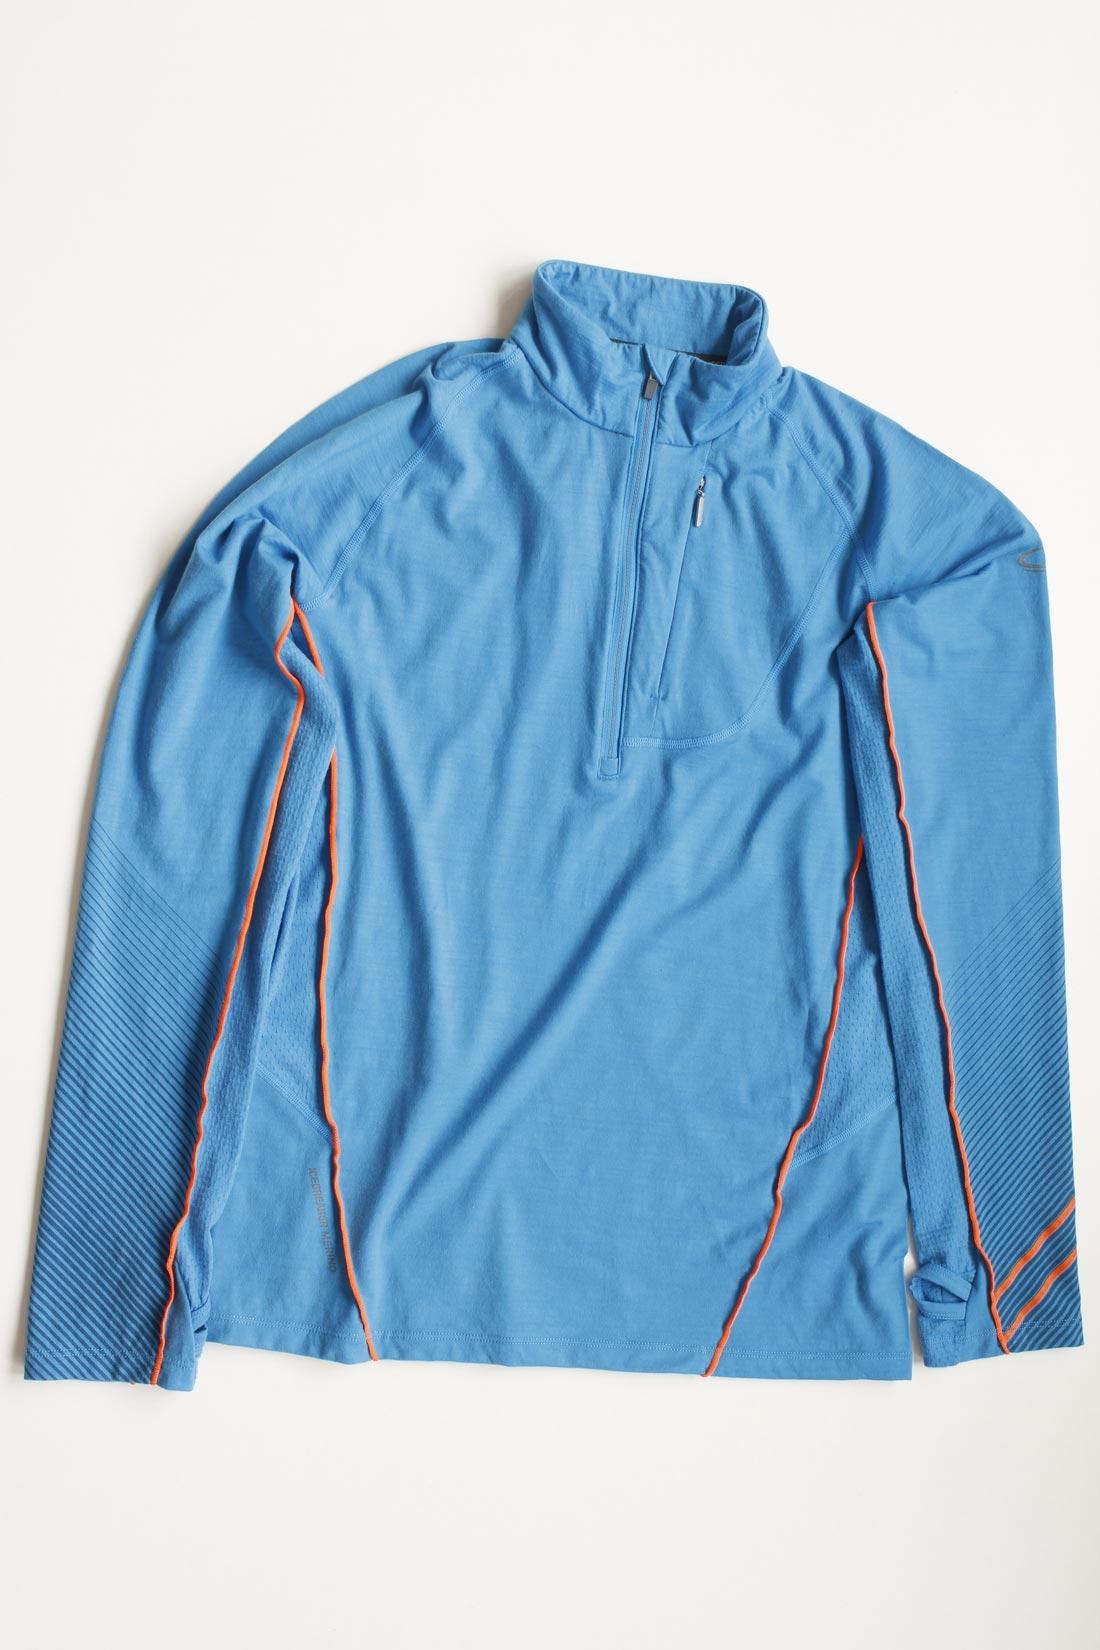 Le tee-shirt en laine mérinos Icebreaker Drive Long Sleeve Half Zip, Ph. Moctar KANE.